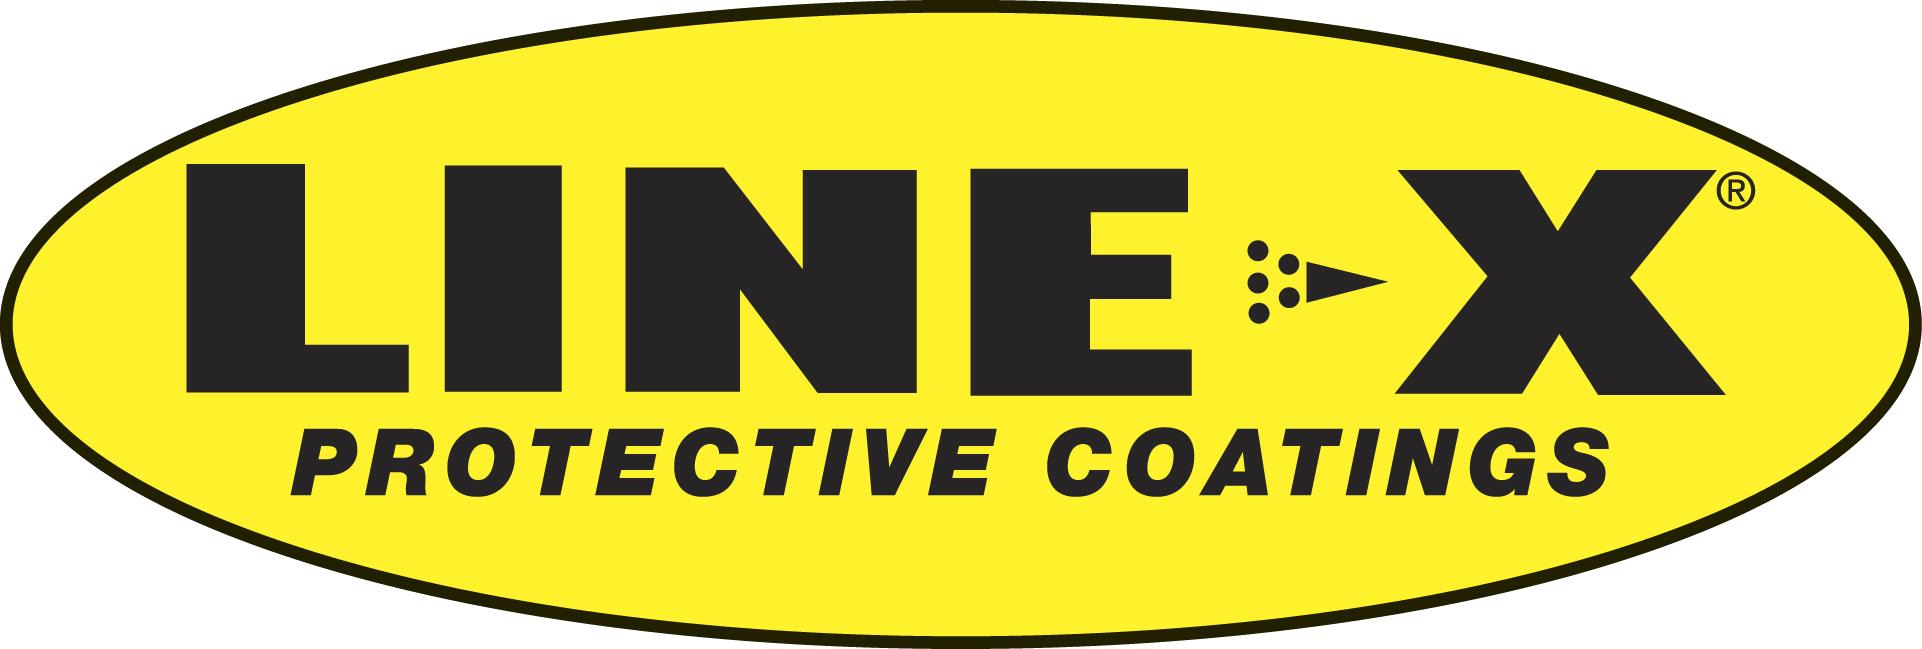 line_x_logo_protective